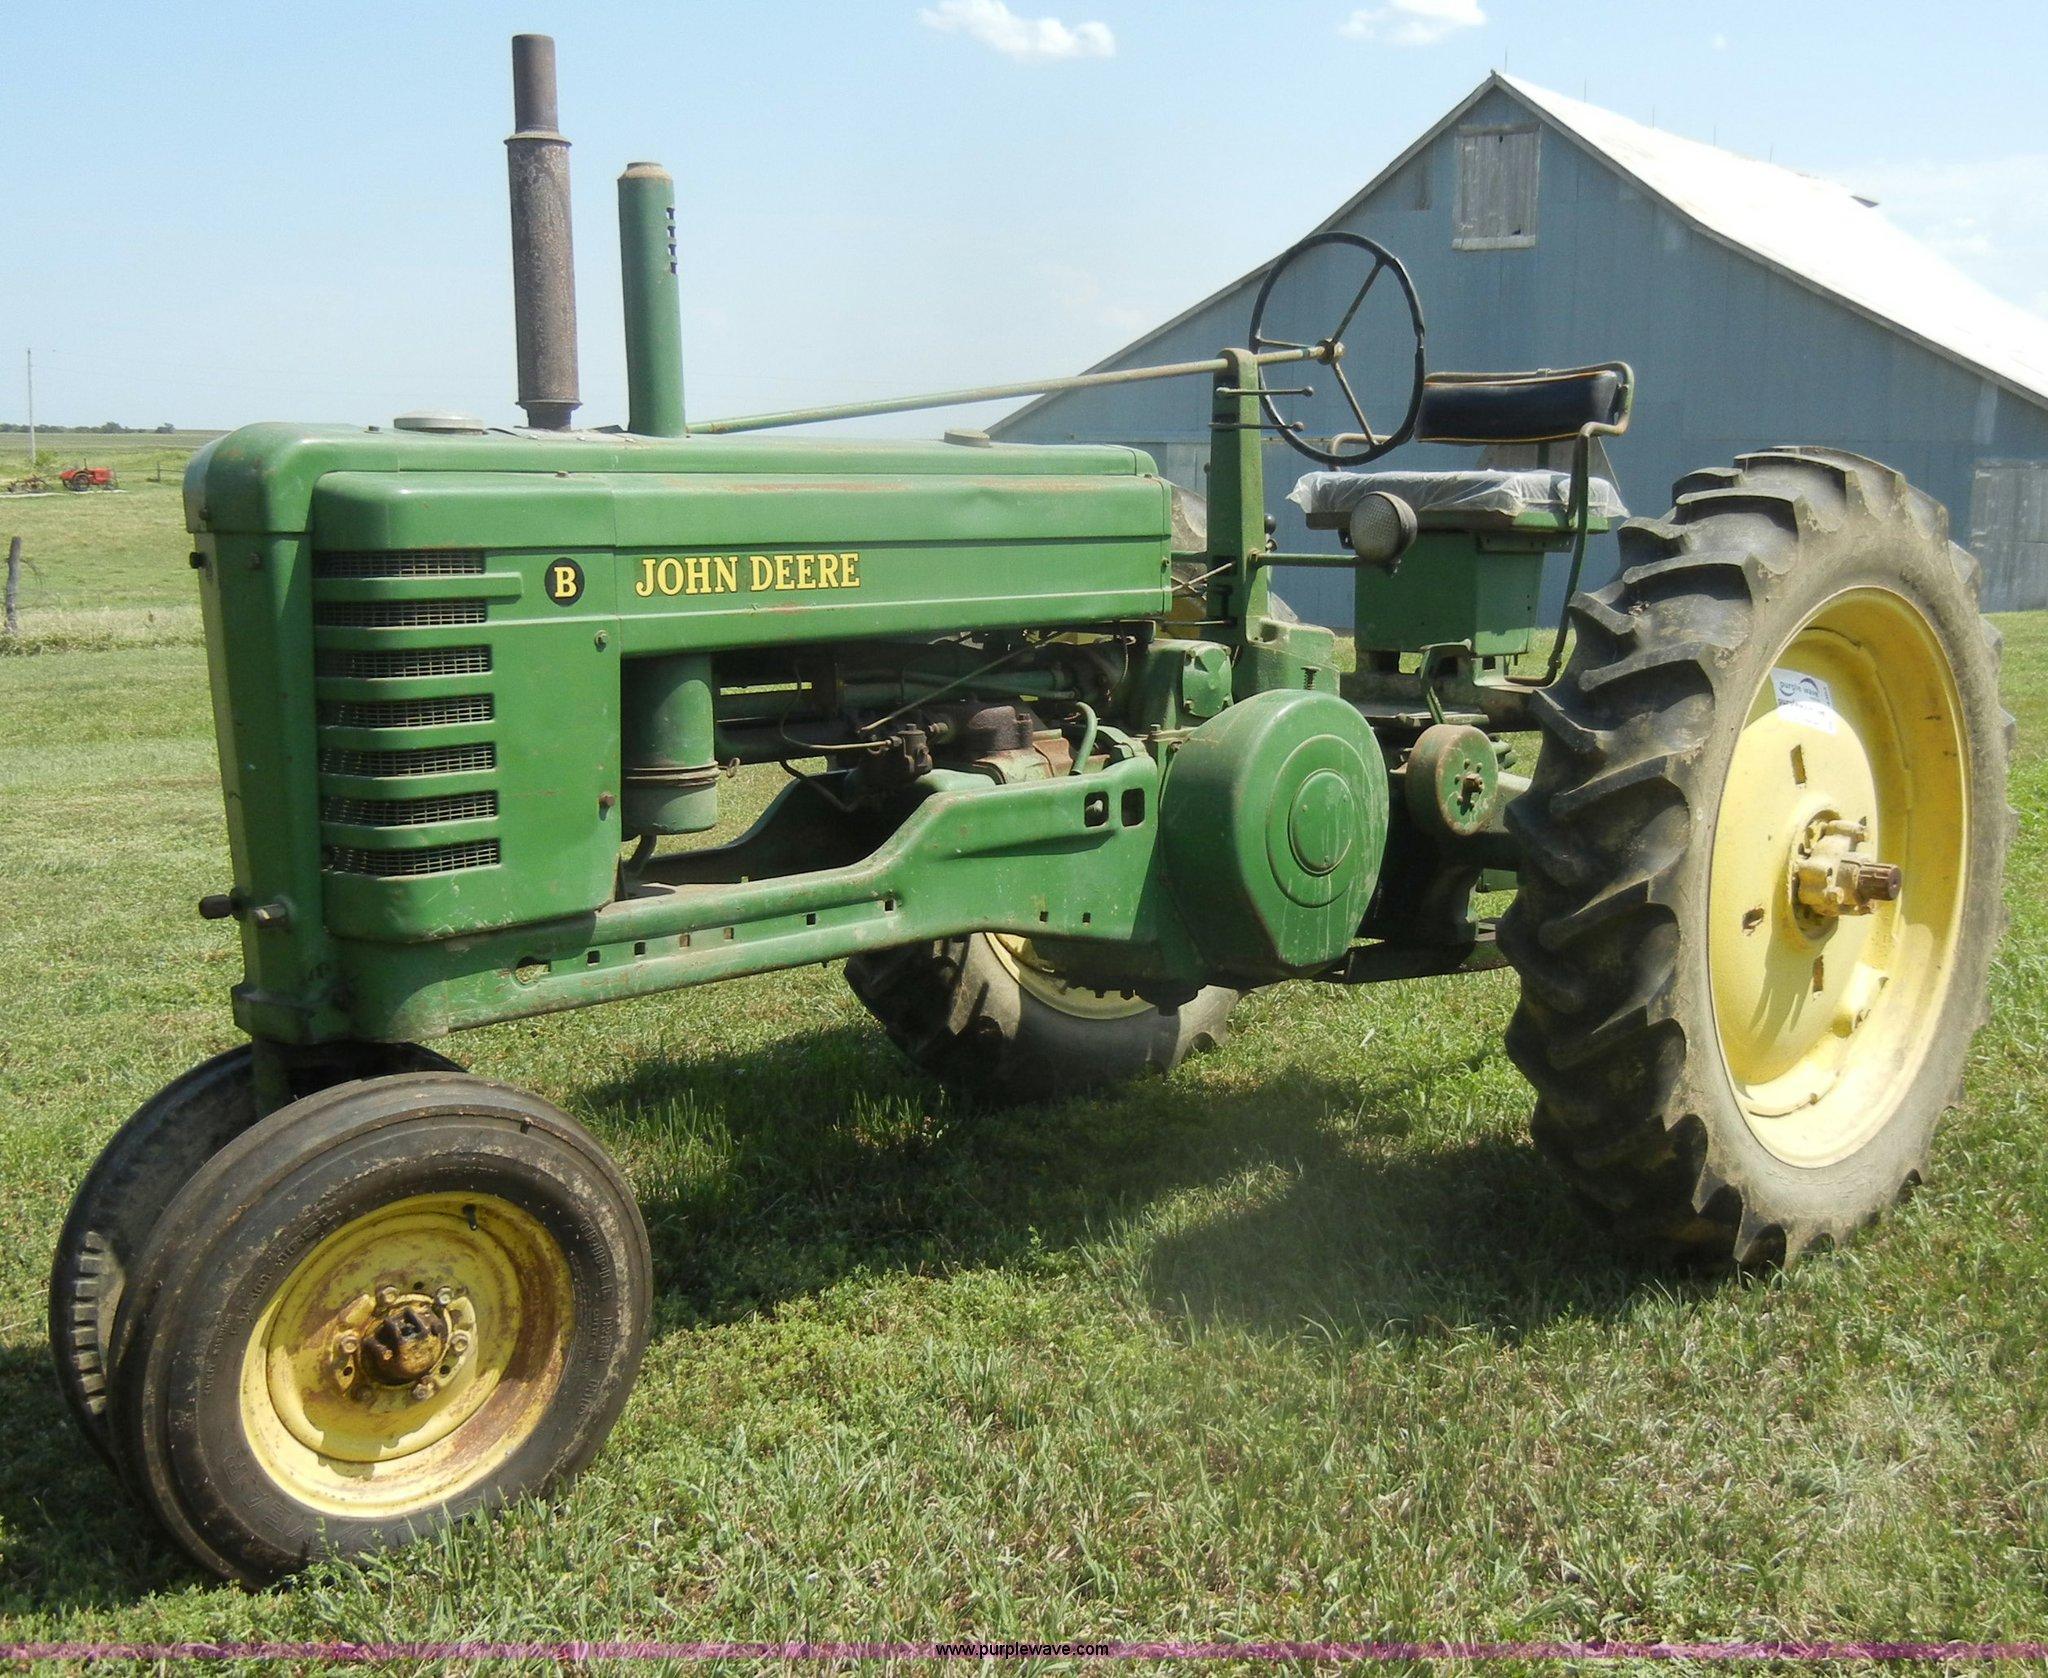 D4363 image for item D4363 1950 John Deere B tractor